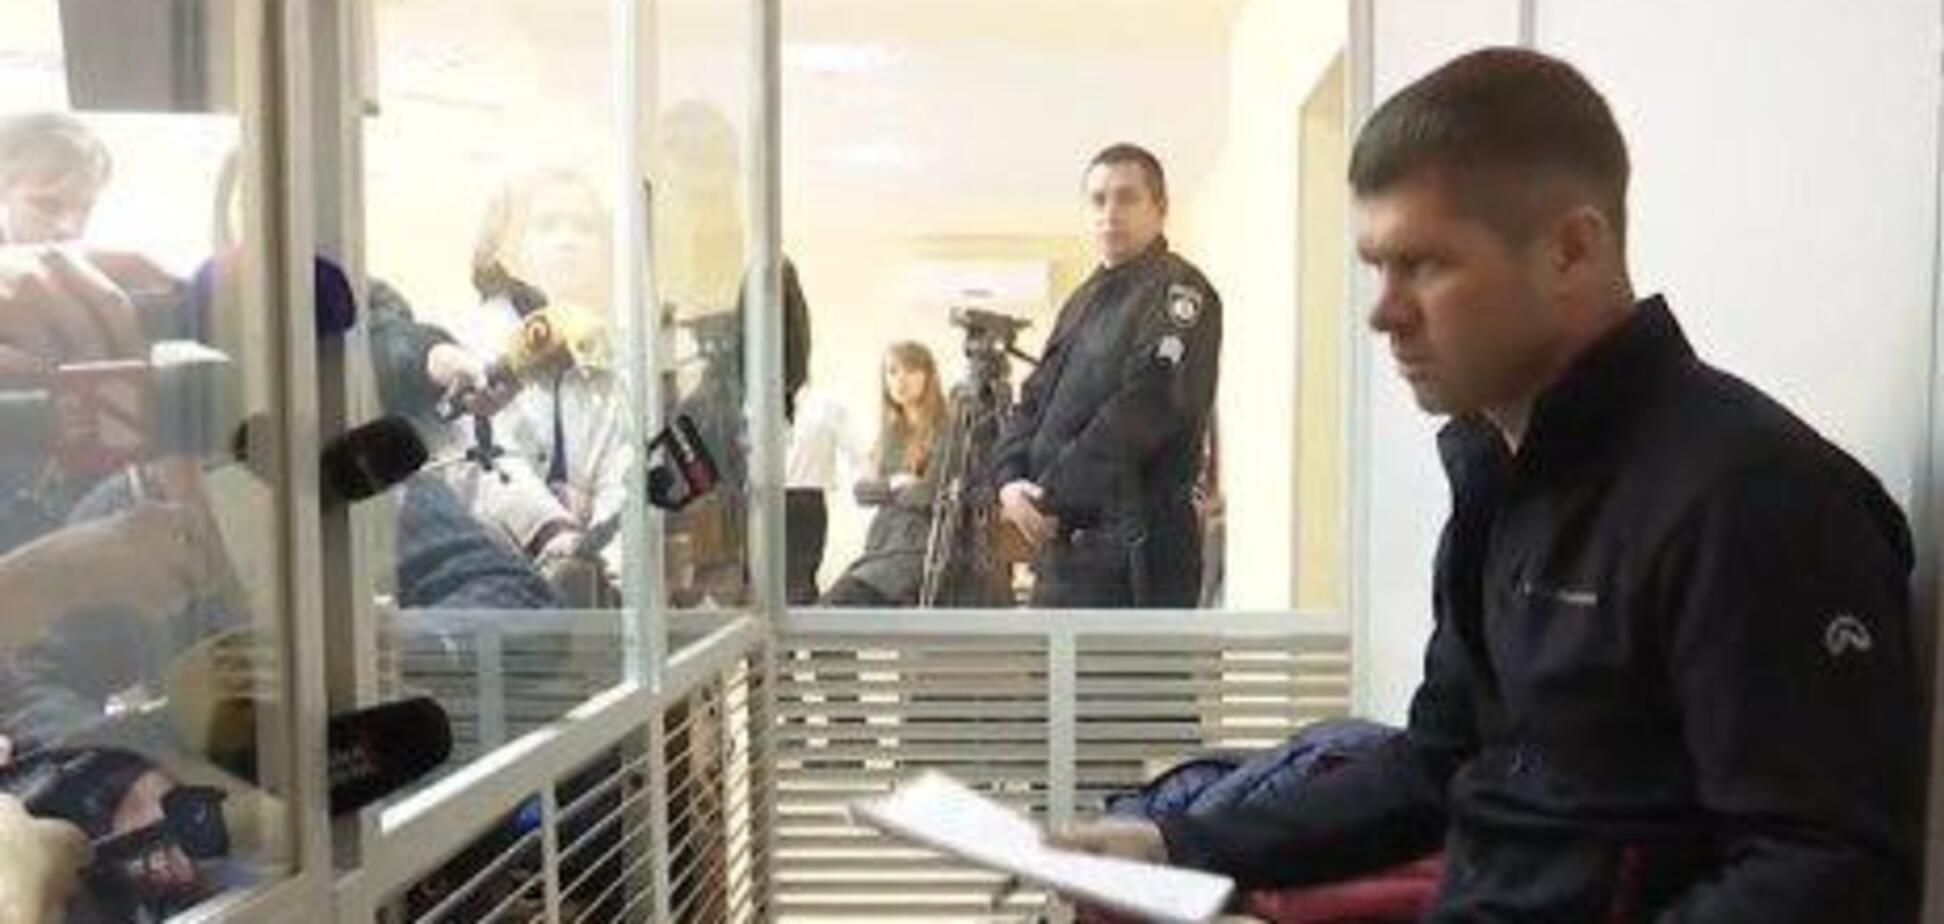 Загибель Поплавської: водій автобуса описав момент аварії з ''Дизель Шоу''